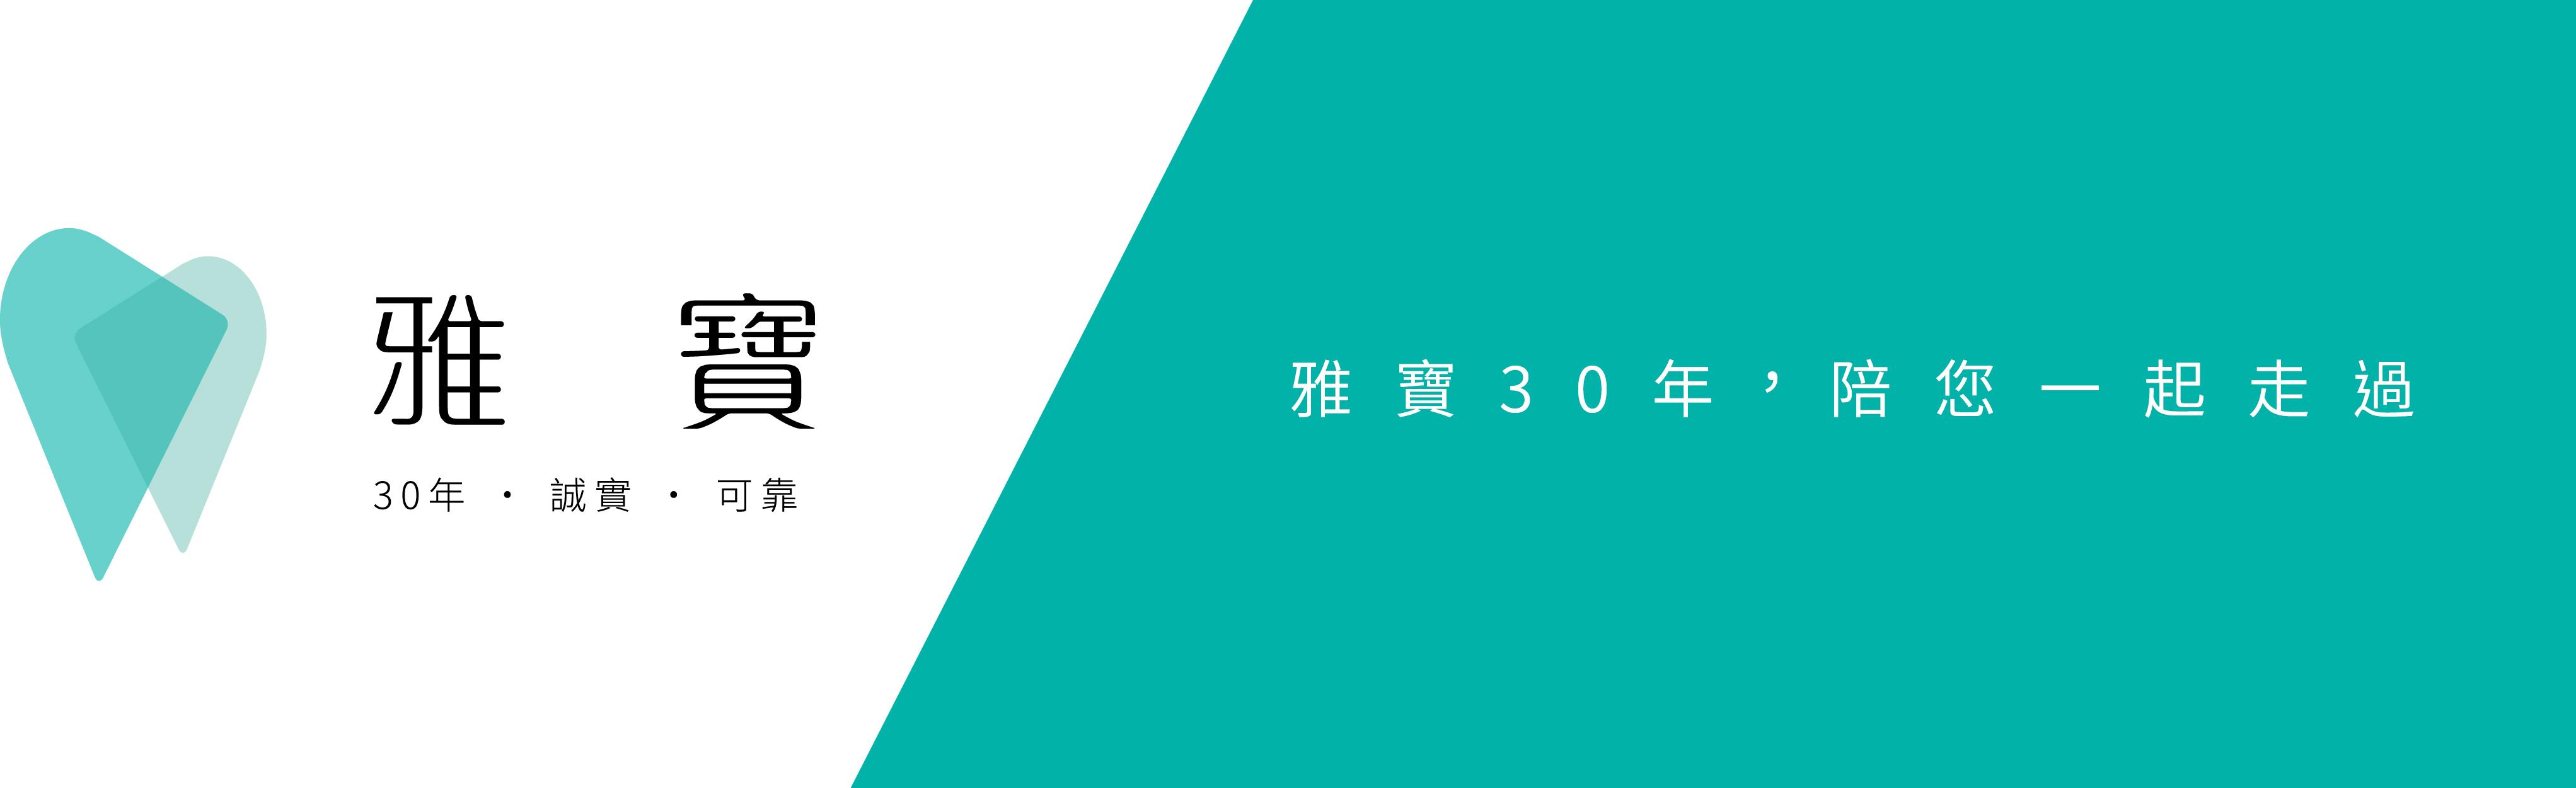 banner-雅寶